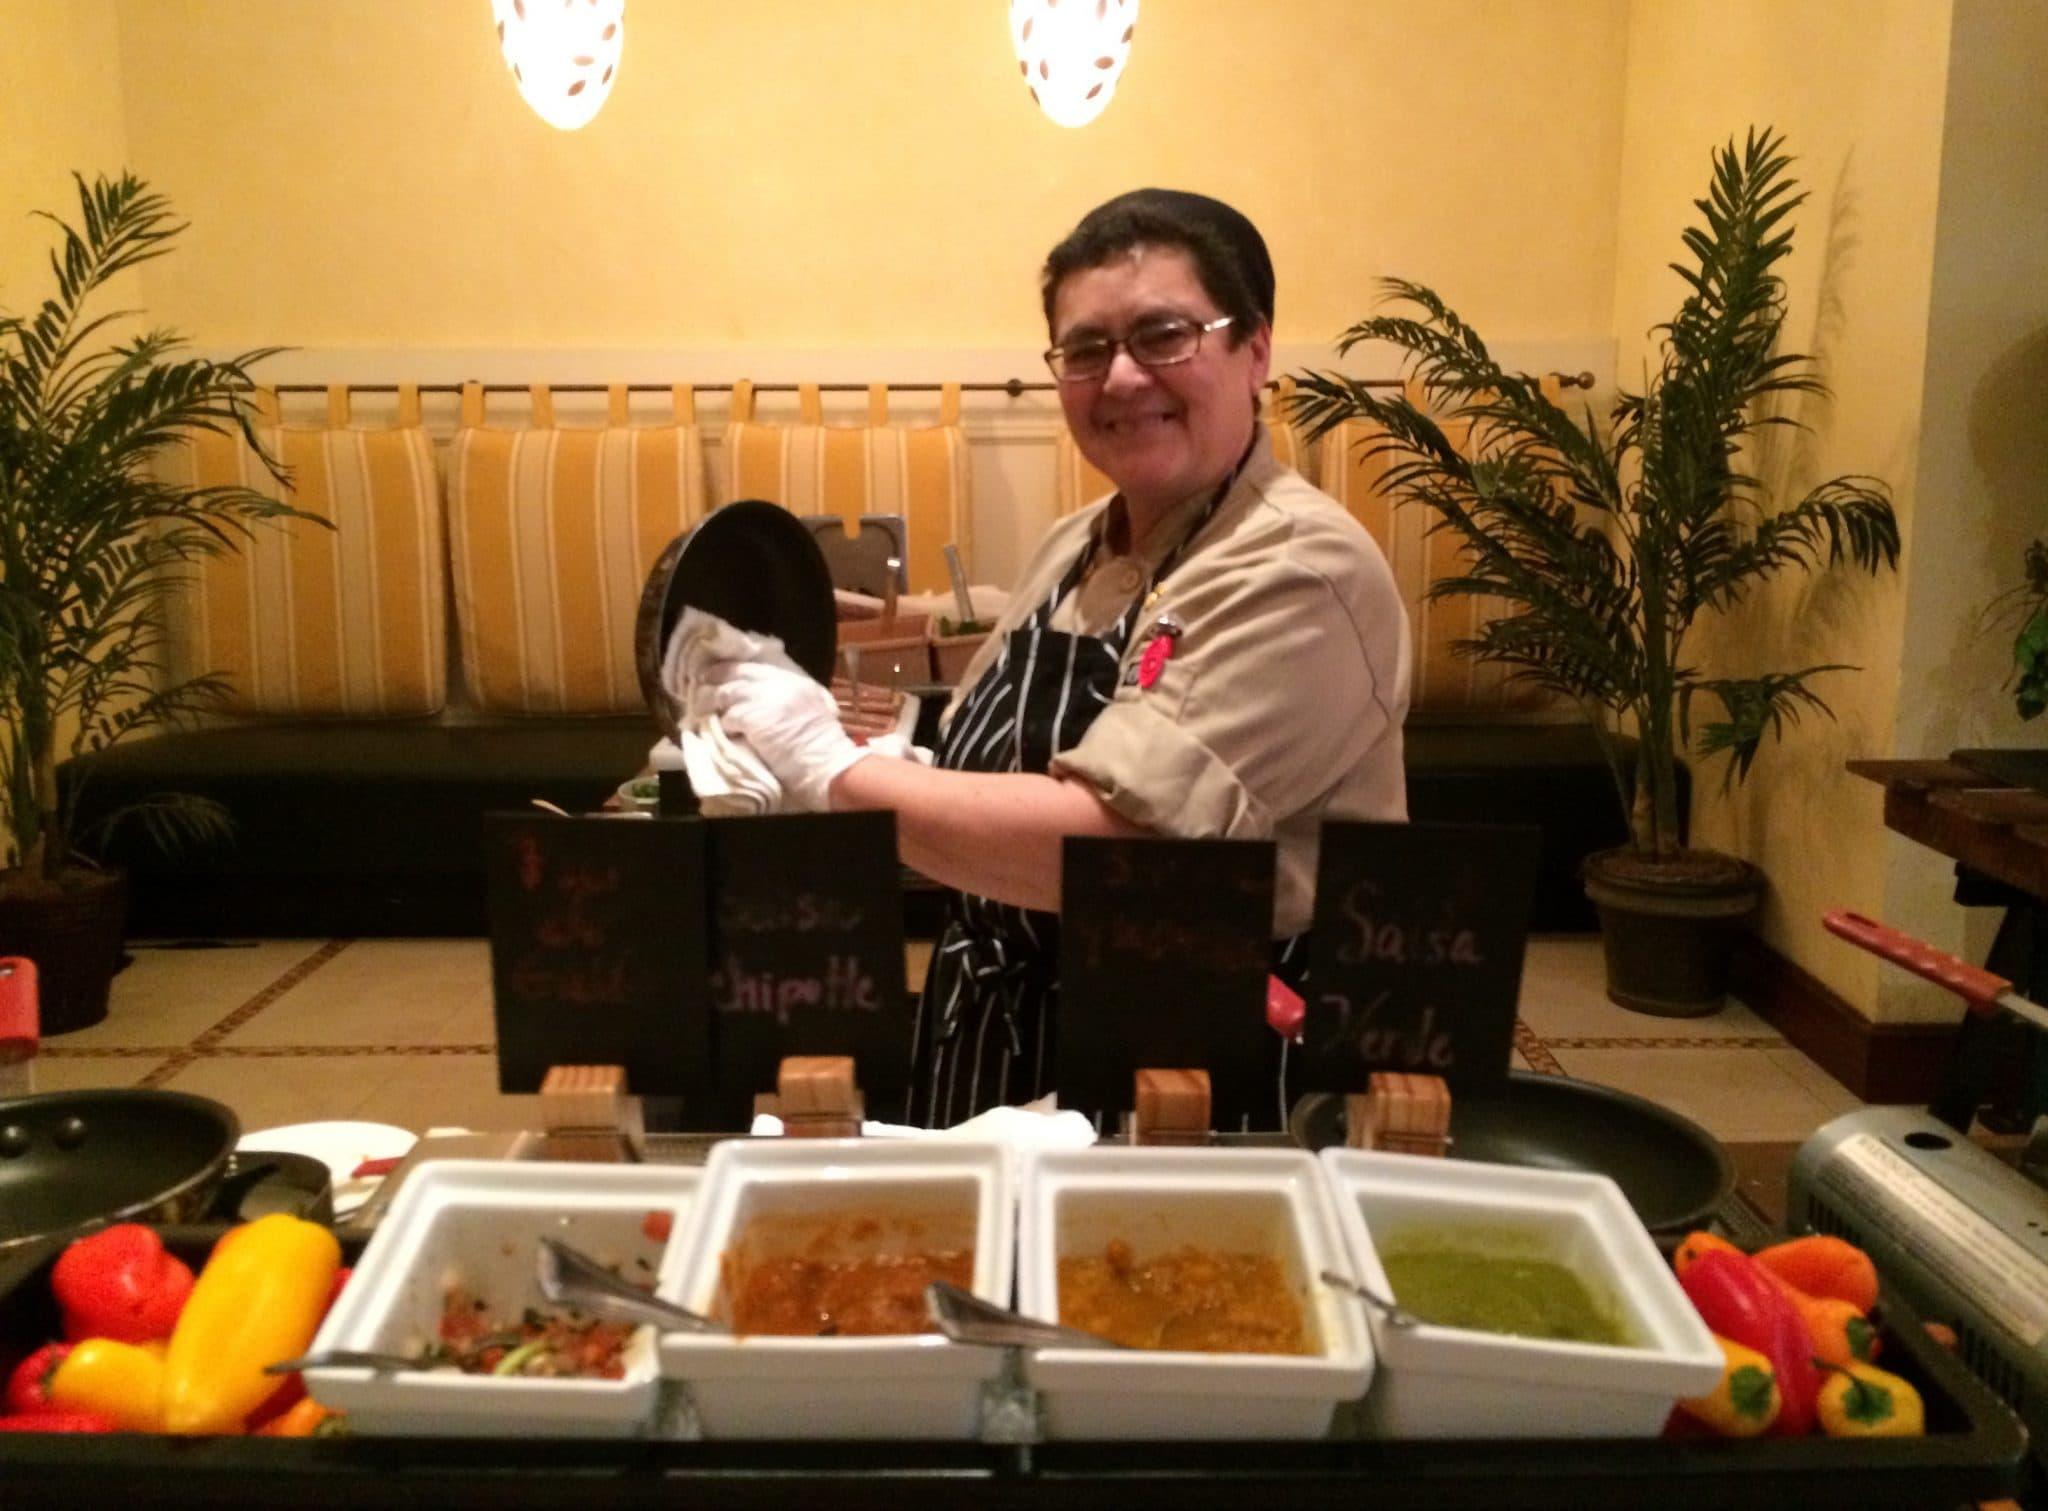 Trevi S Breakfast Buffet At The Omni Orlando Resort At